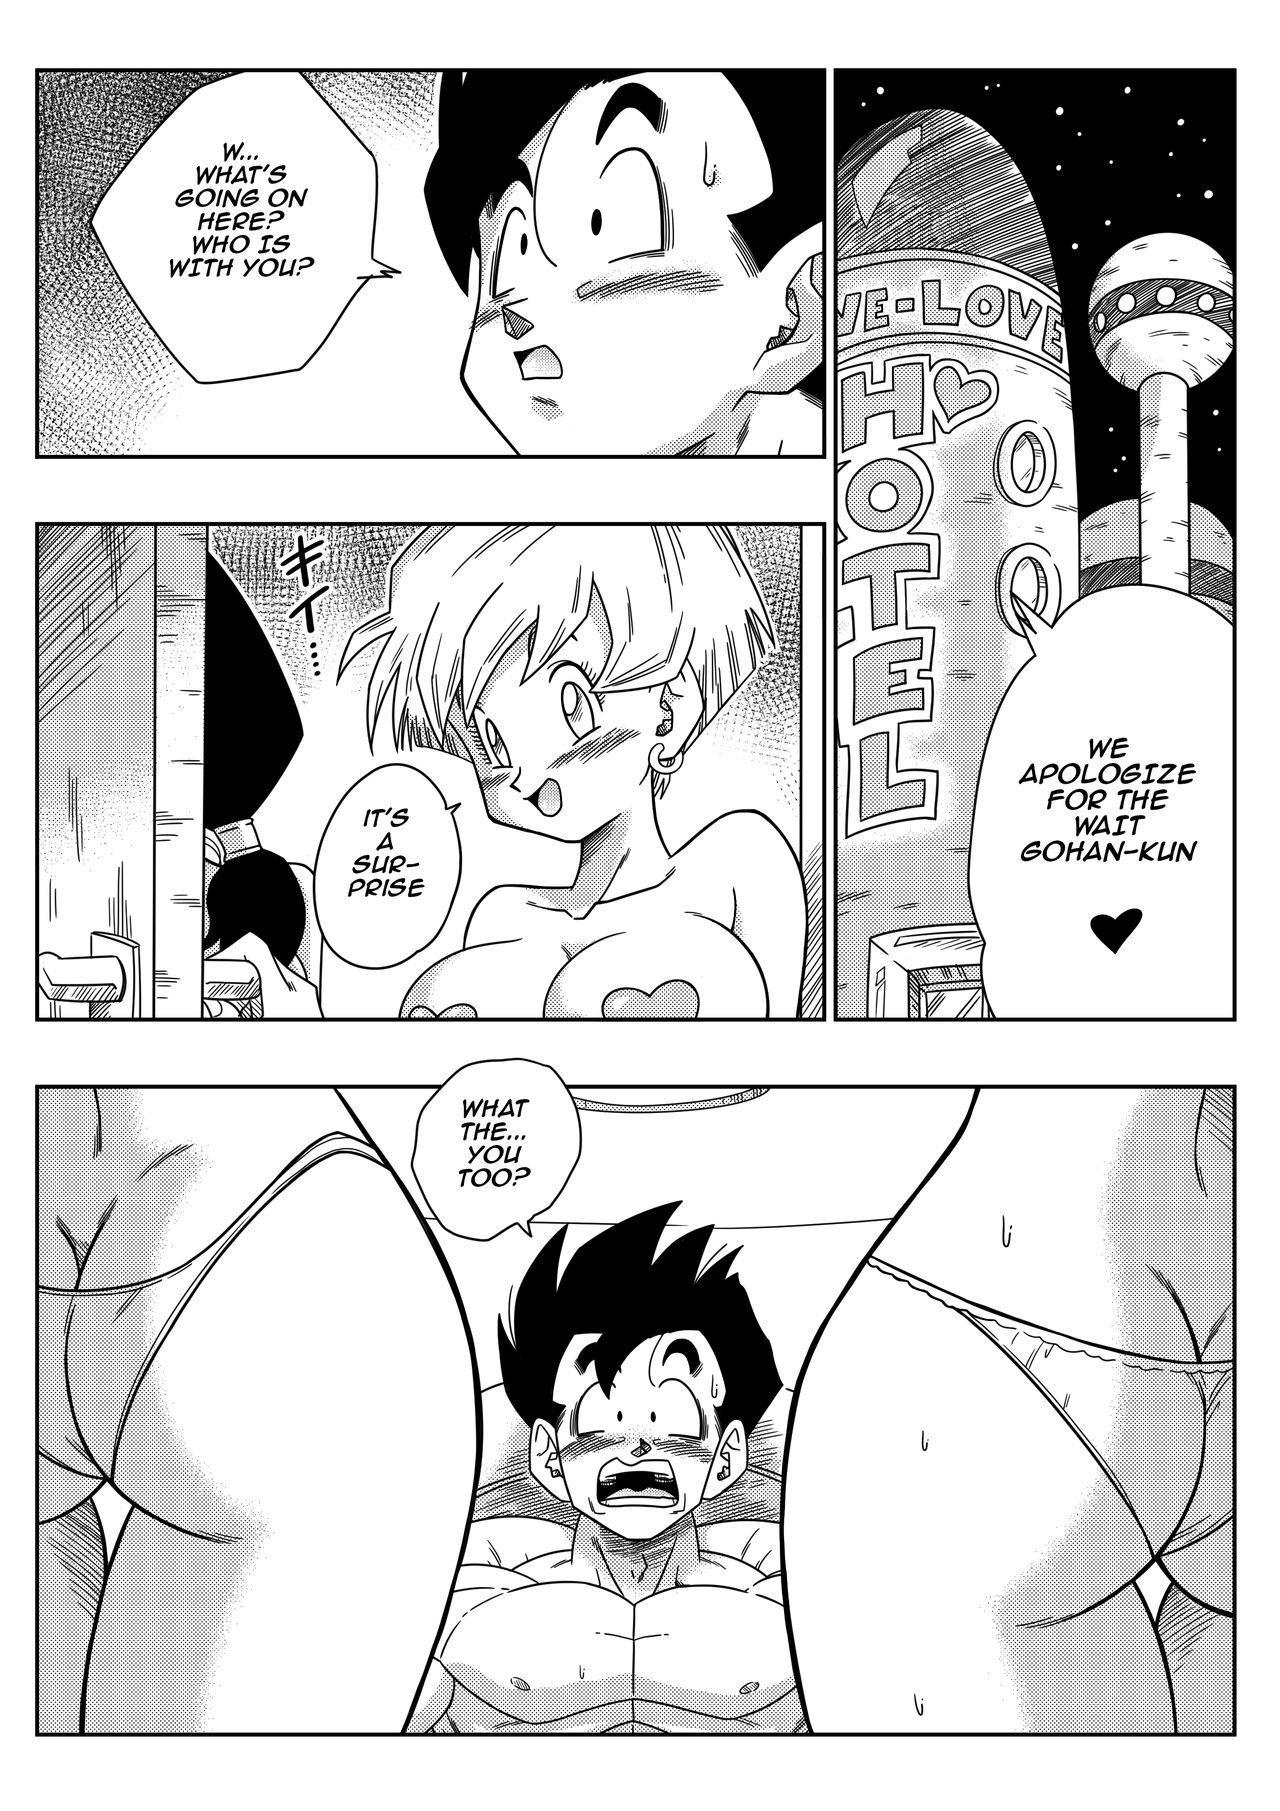 [Yamamoto] LOVE TRIANGLE Z PART 2 - Takusan Ecchi Shichaou! | LOVE TRIANGLE Z PART 2 - Let's Have Lots of Sex! (Dragon Ball Z) [English] 3